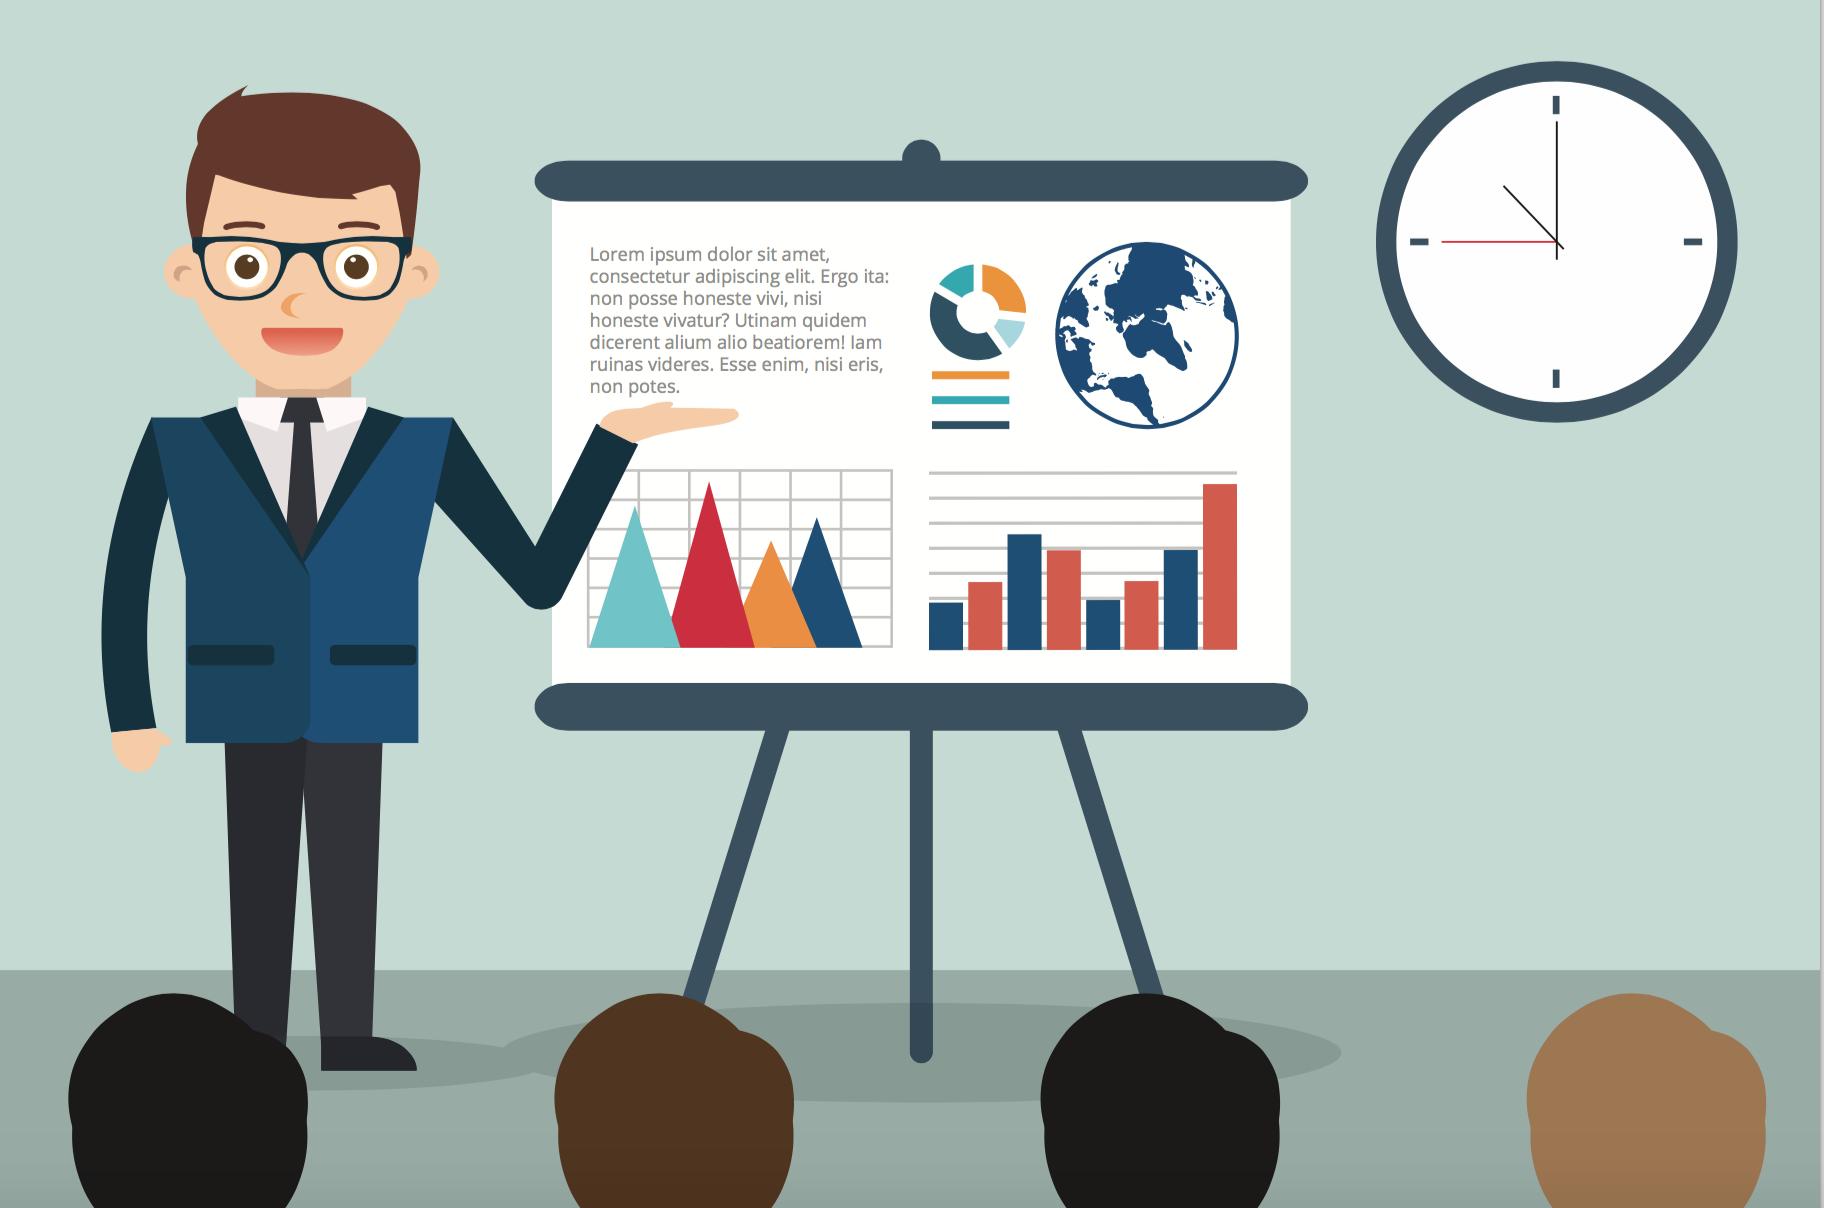 Maak blogberichten van presentaties - afbeelding van man die presentatie geeft | Anneke van der Voort-Kruk, PRminded | Adviseur Social Media Plan en Strategie | LinkedIn trainer | voor ZZP en MKB | Bavel, Breda, Tilburg